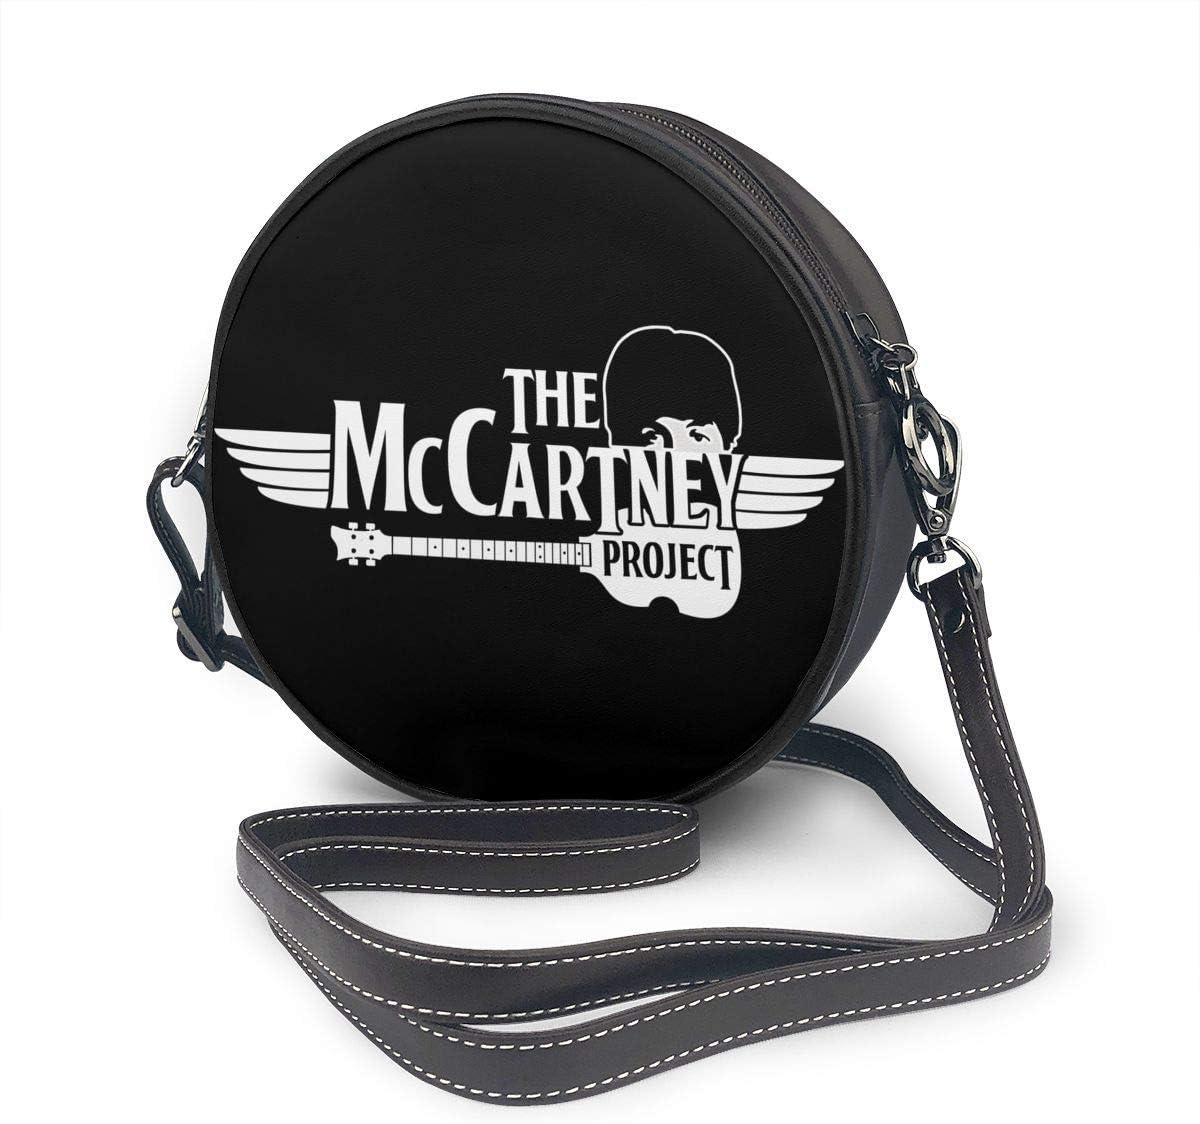 Liuerfeng Paul McCartney Leather Shoulder Round Bag